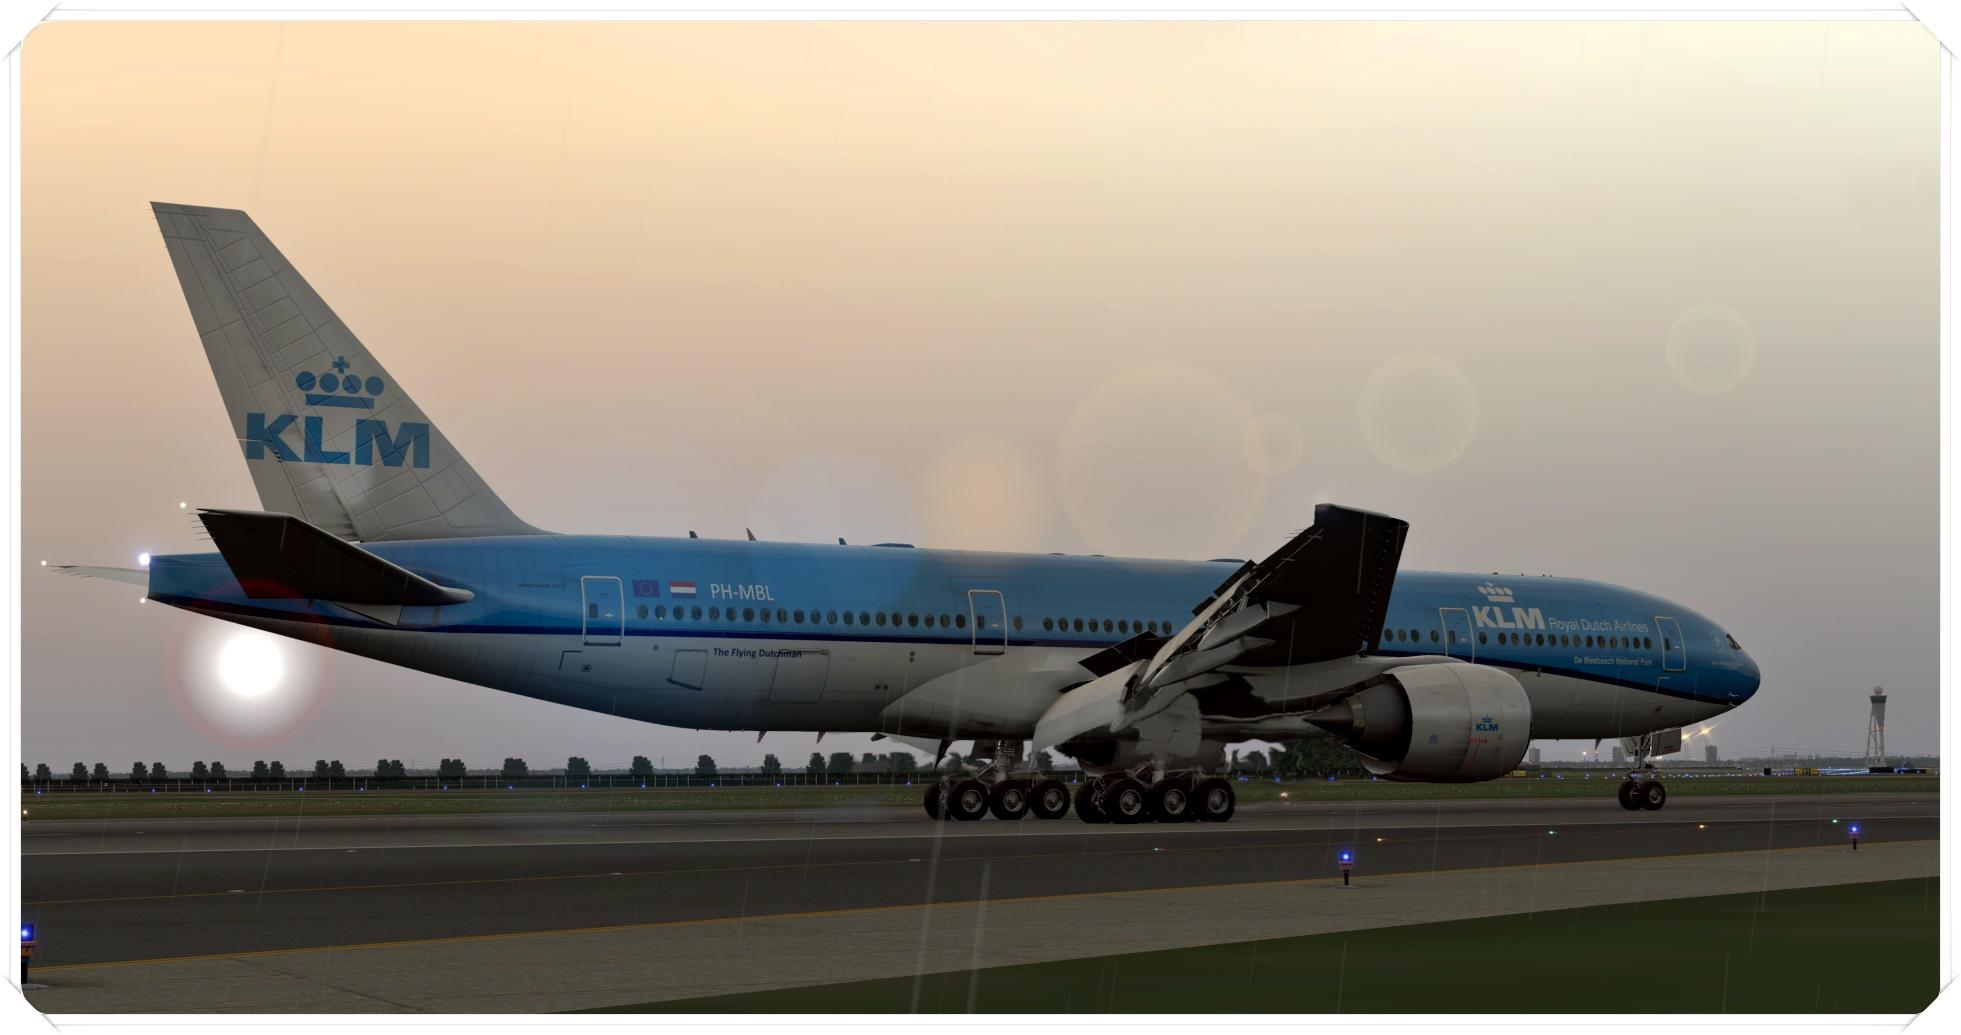 777-200lr_7gfqm9.jpg